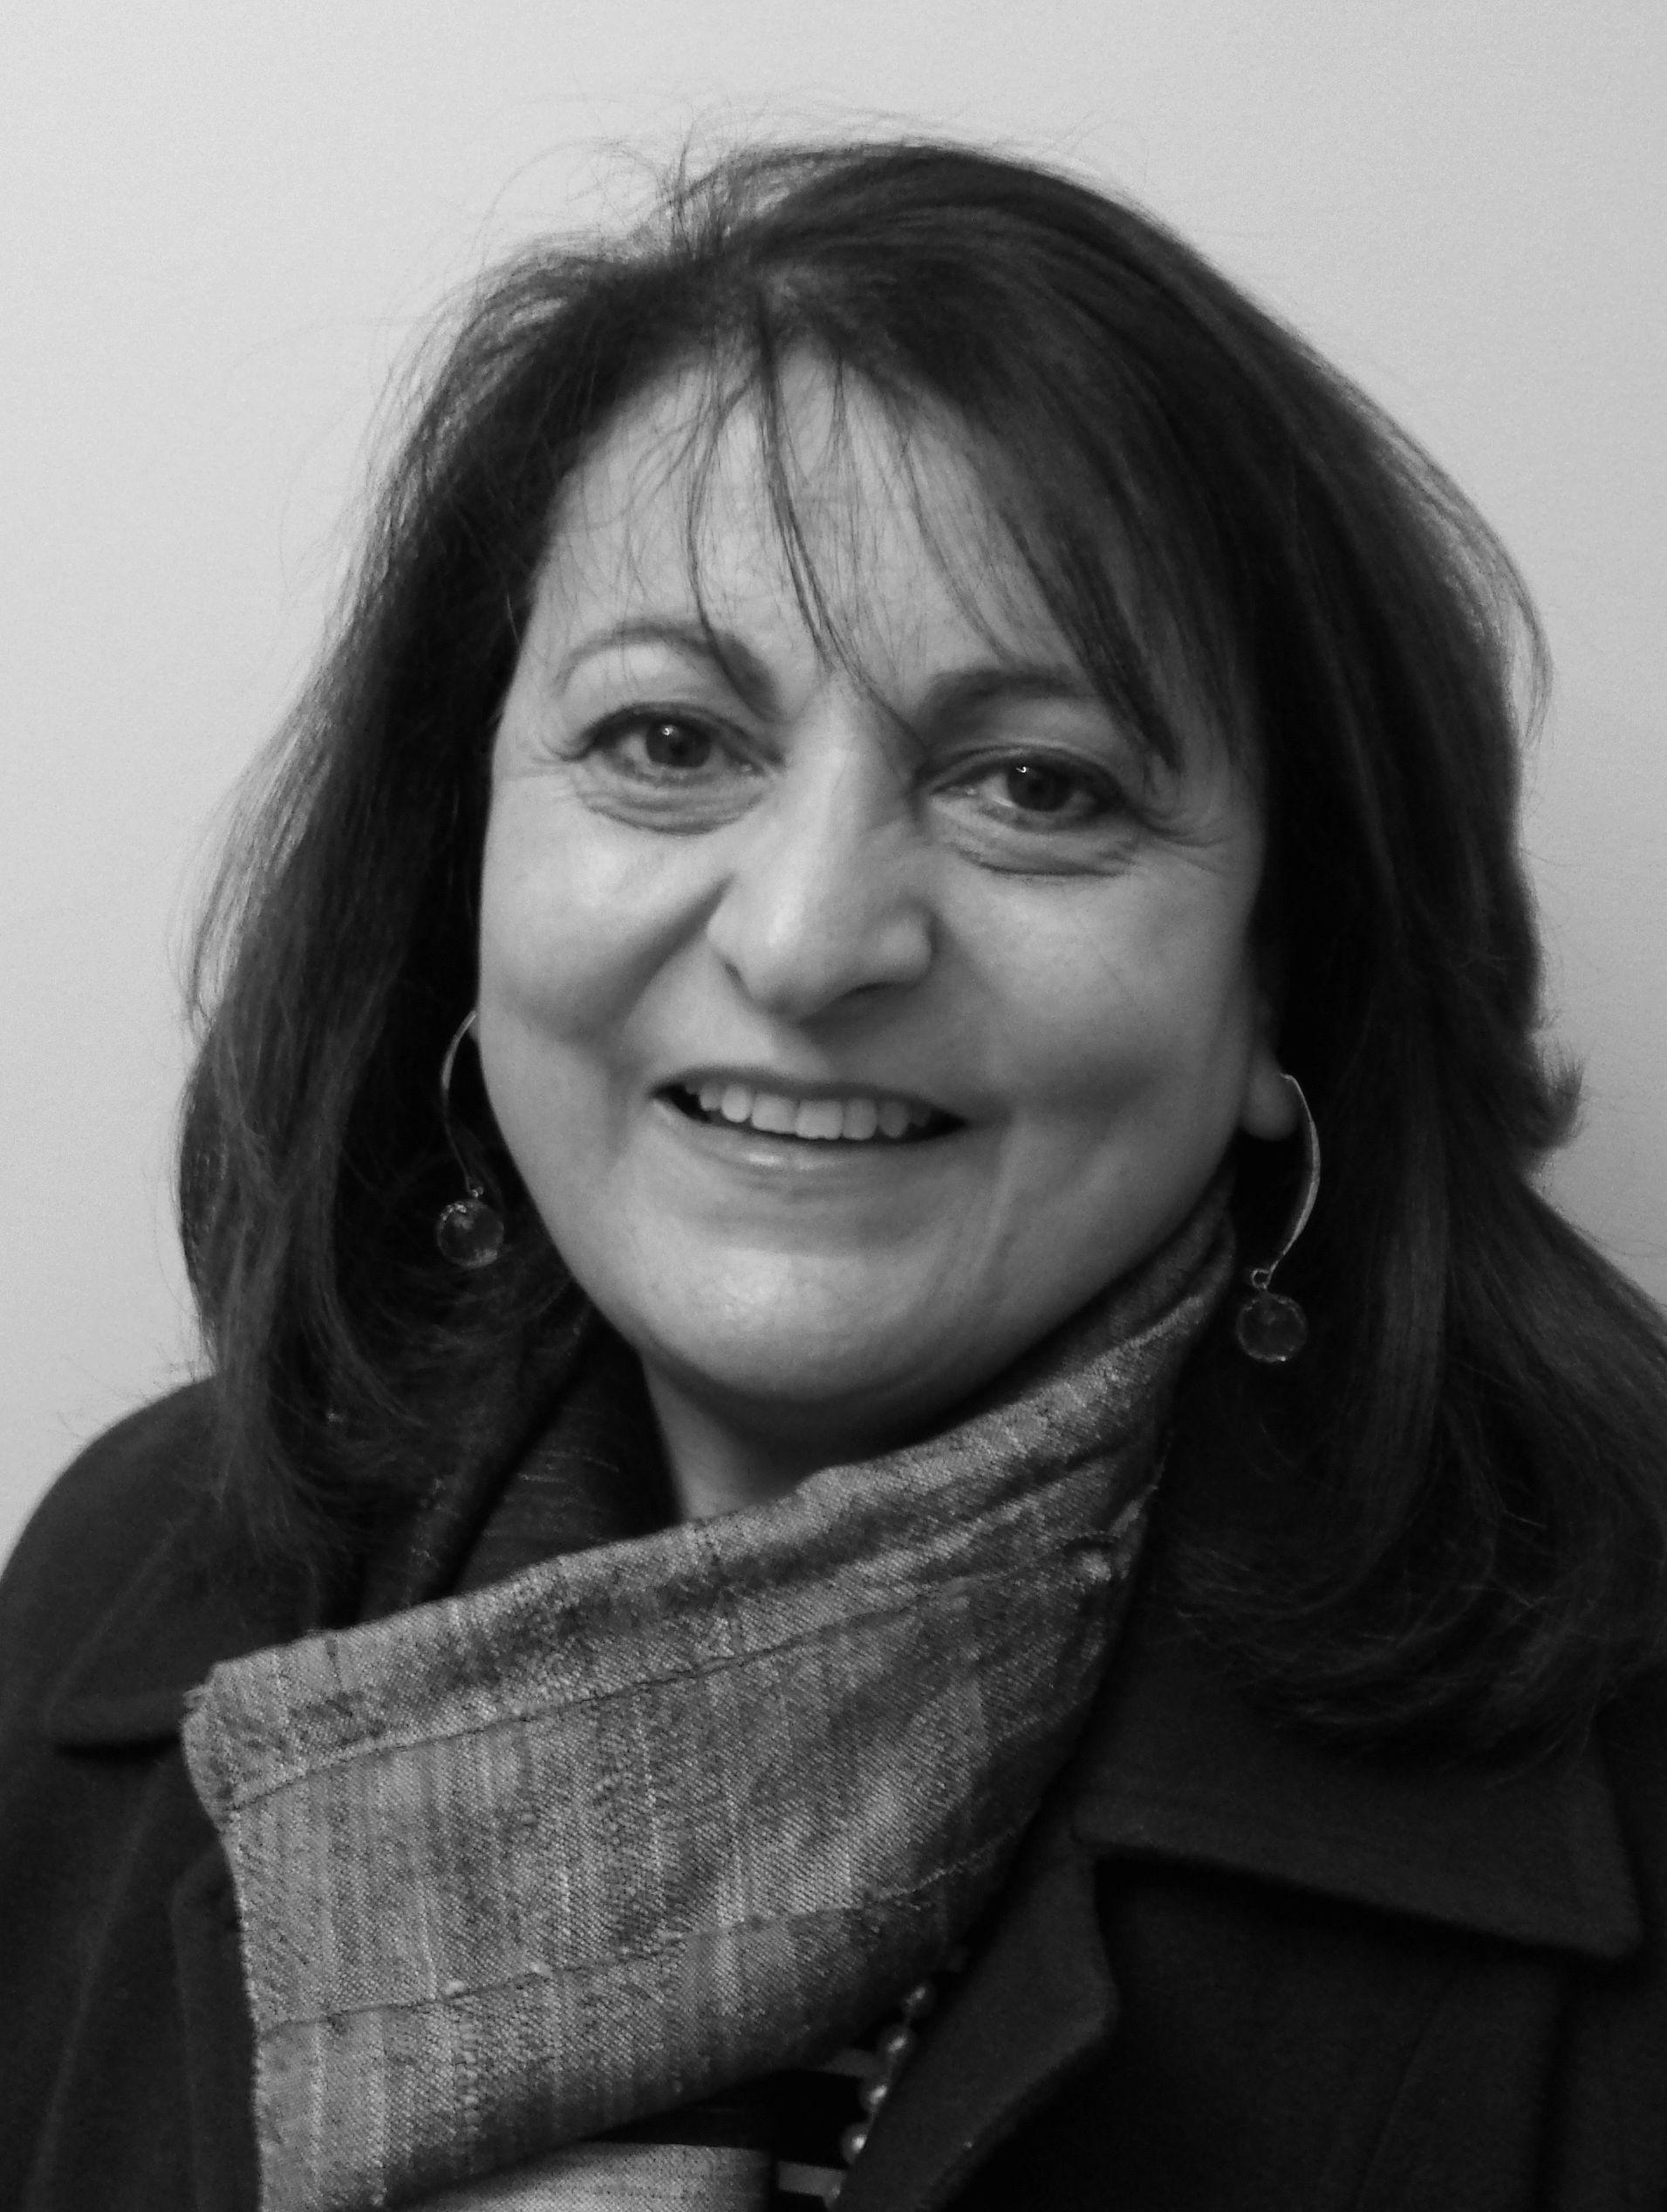 Christine-Koulla Burke